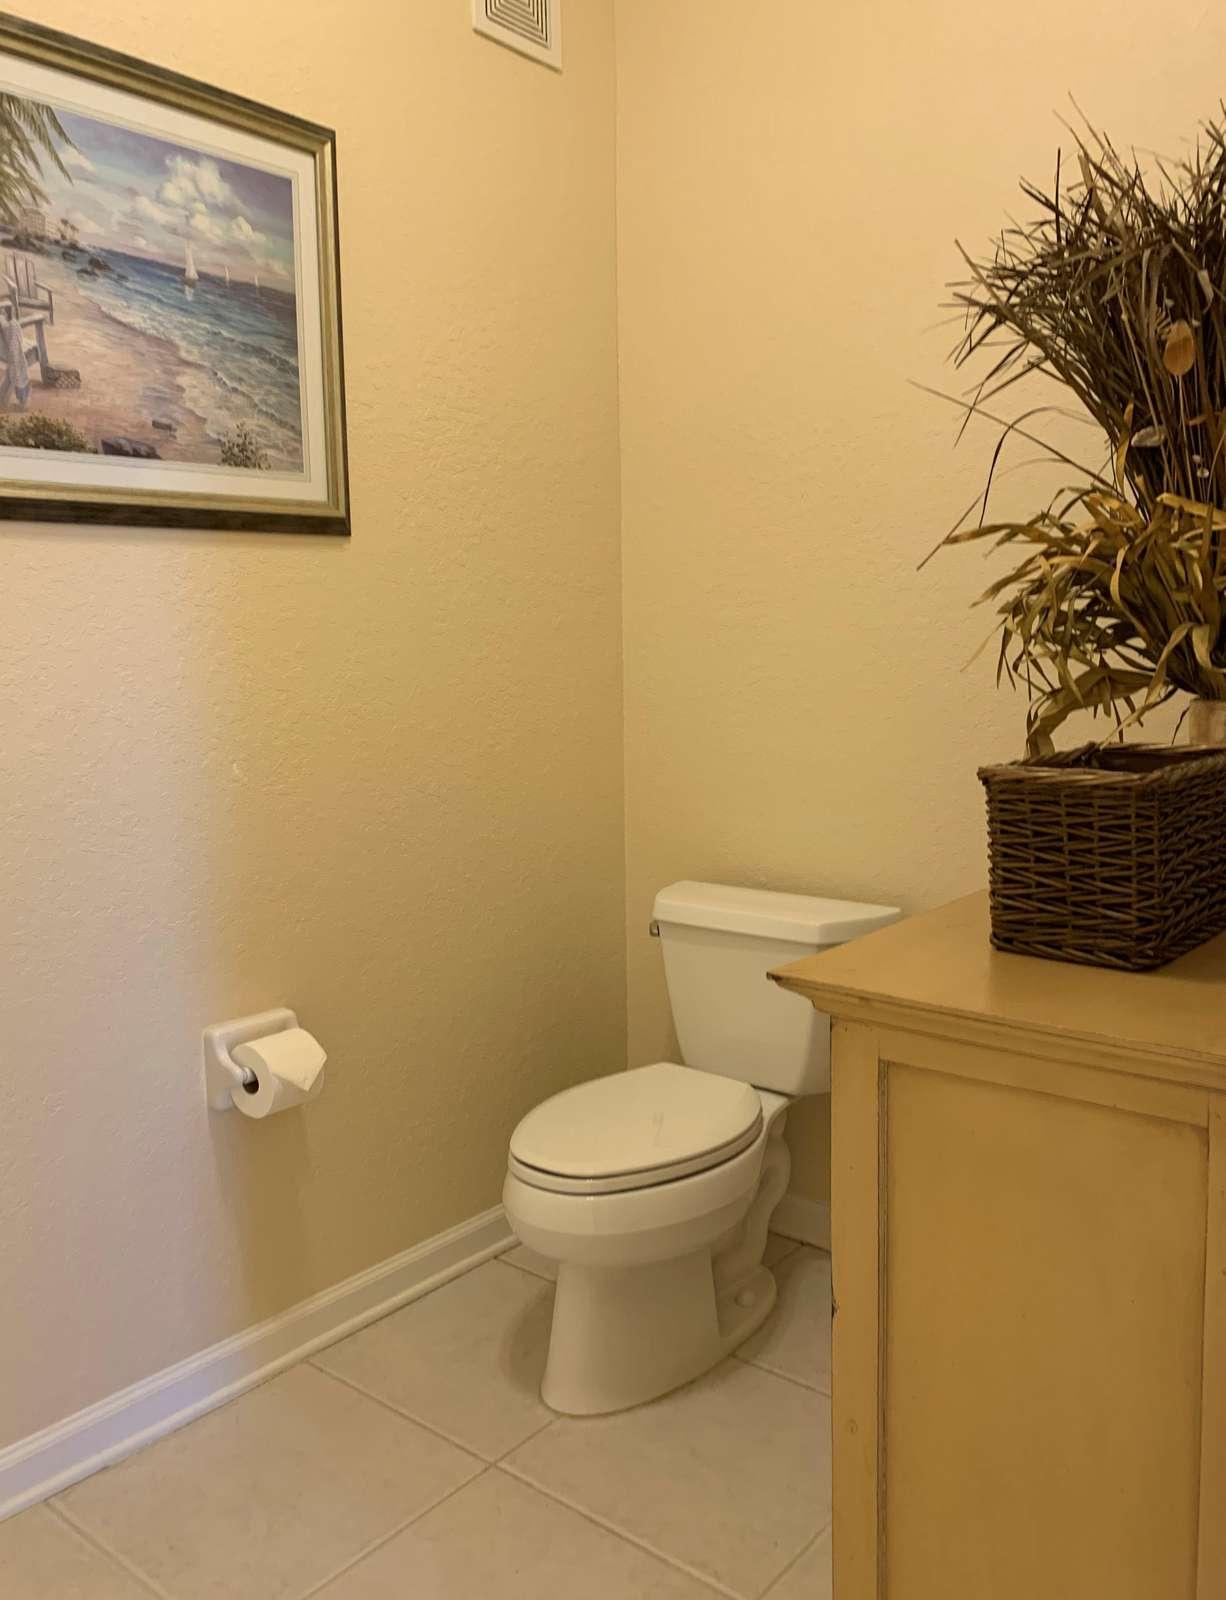 Toilet area master bathroom